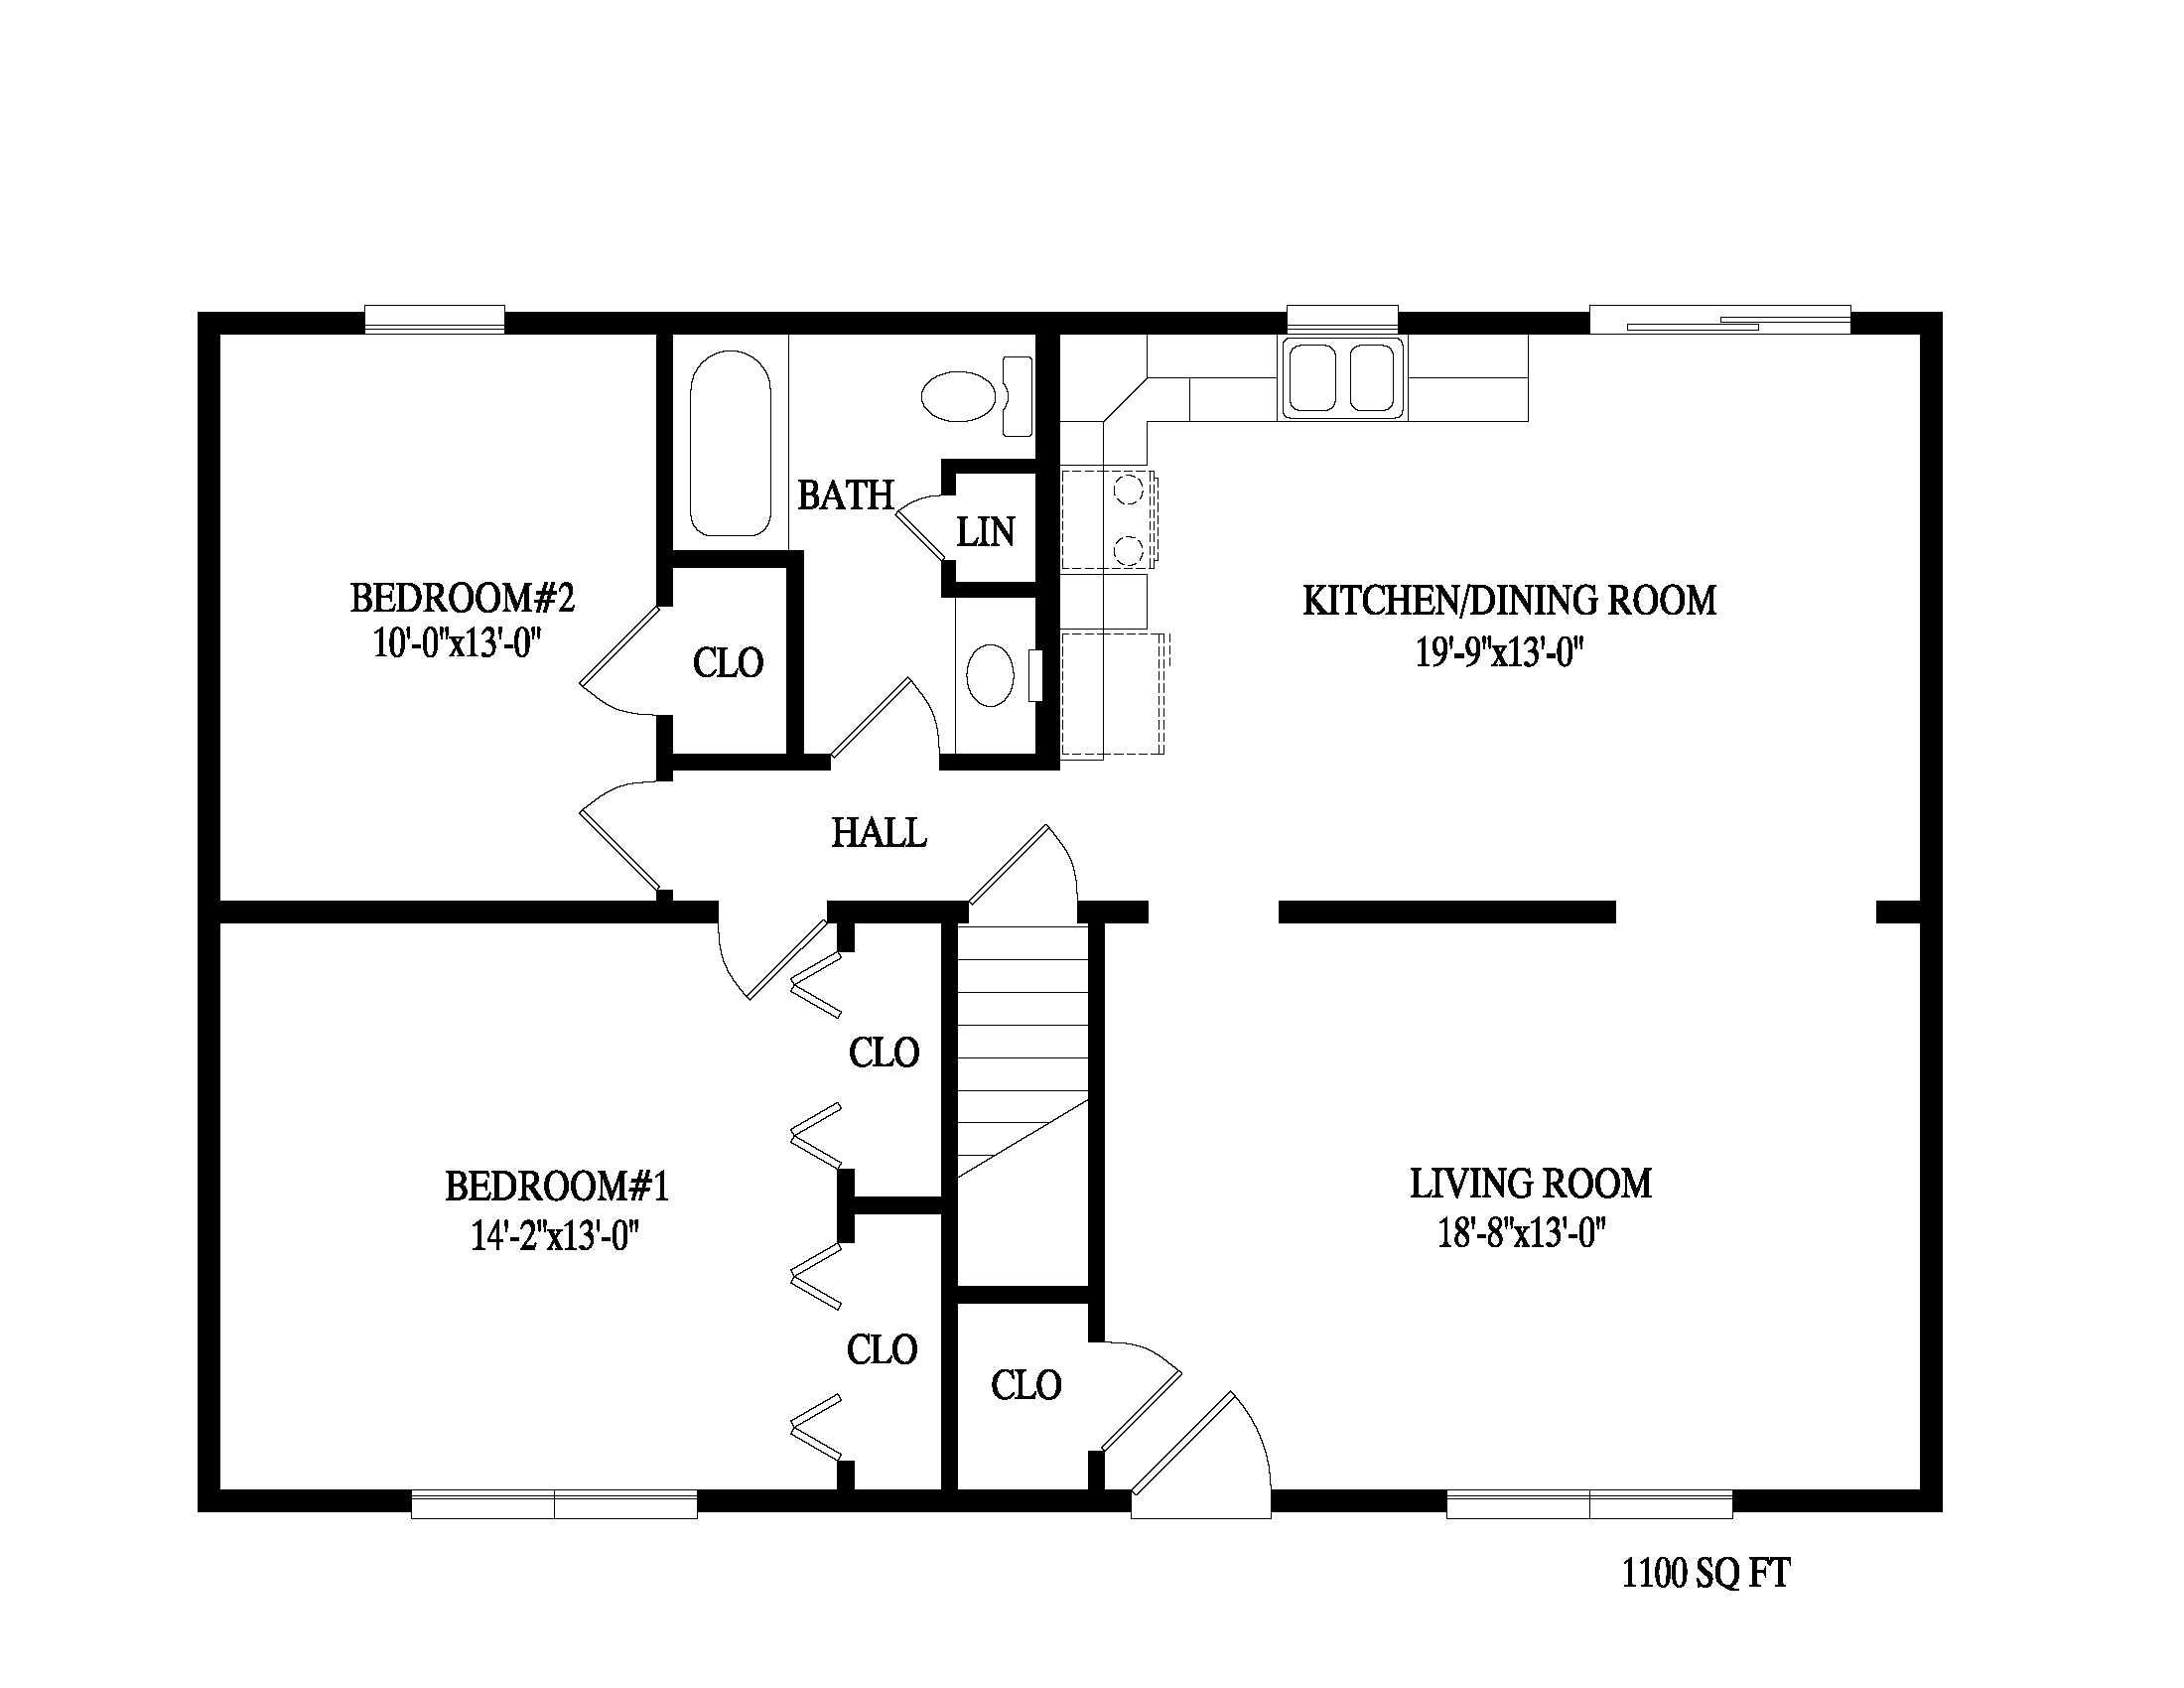 Oakwood homes oakwood homes floor plans oklahoma for Floor plans oklahoma